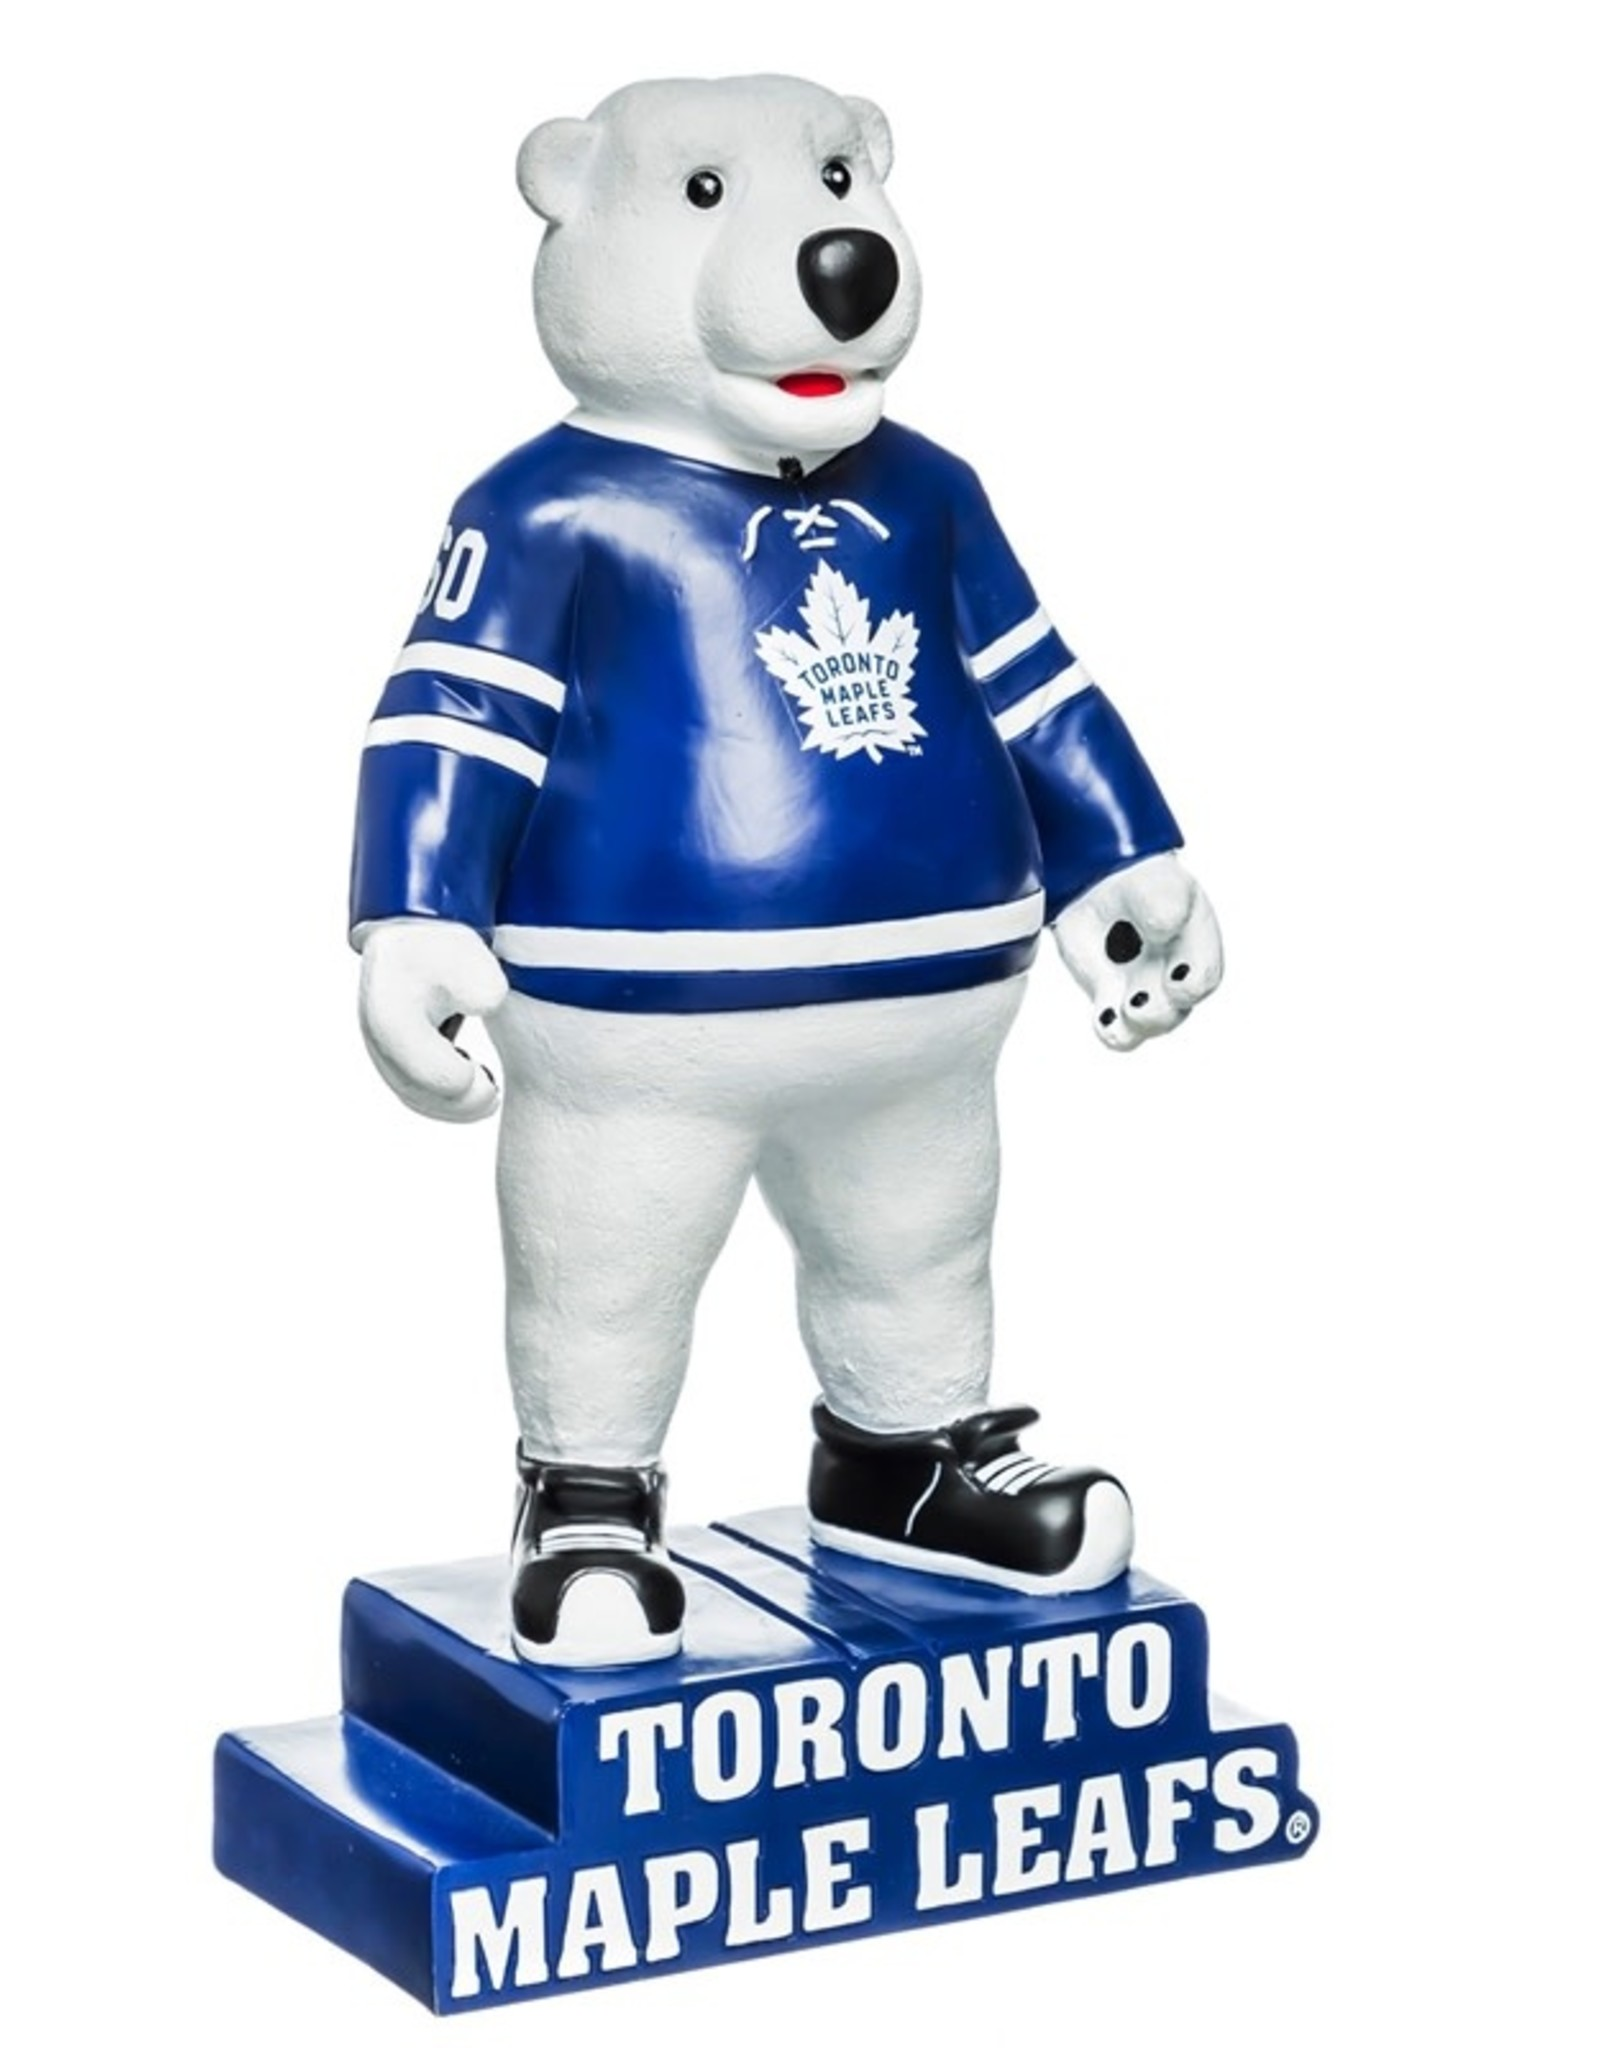 Team Sports Ameica NHL Team Mascot Statue Maple Leafs